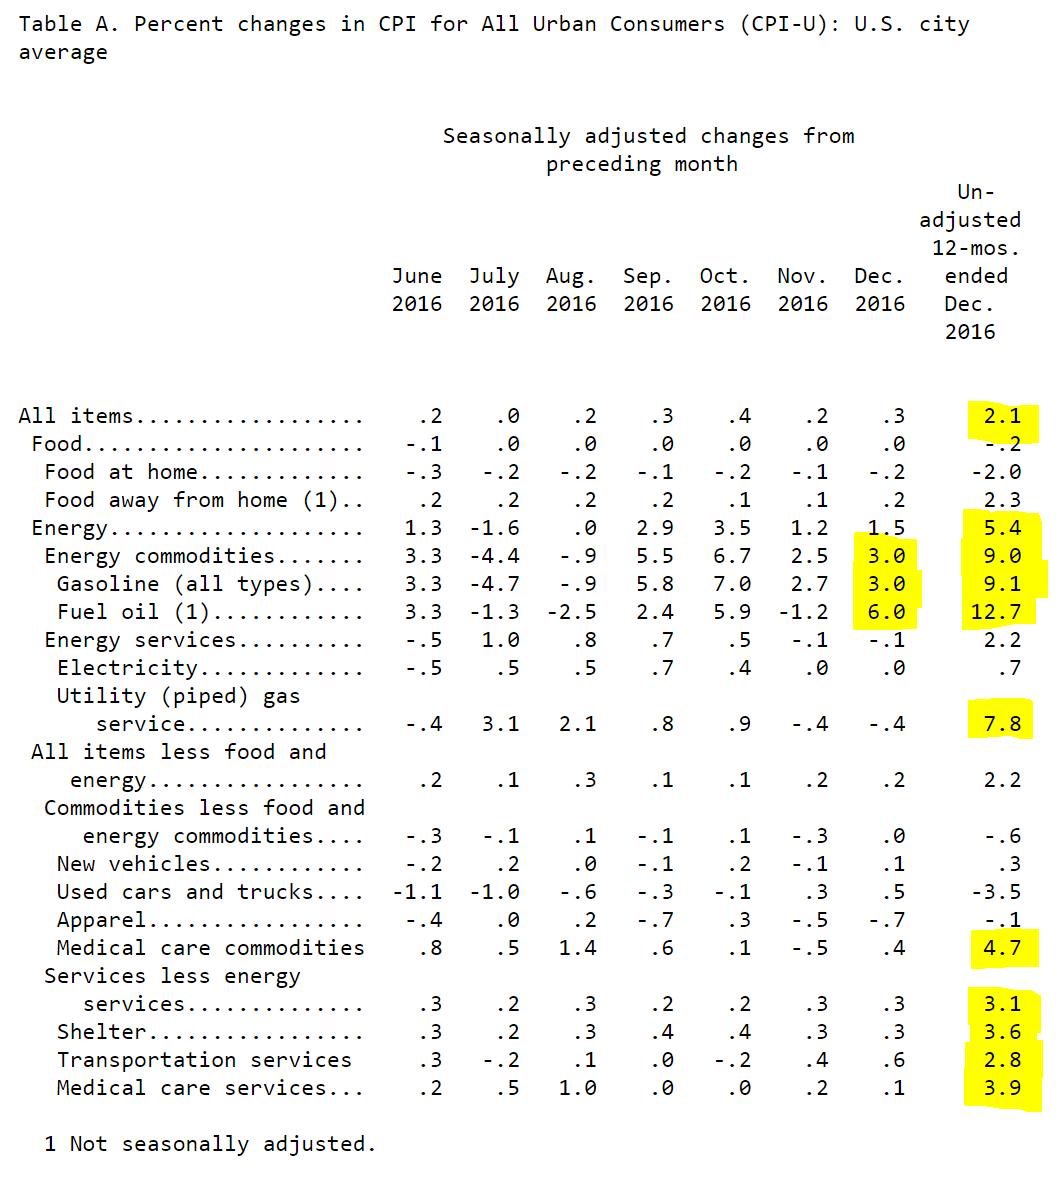 CPI-U - US City Average